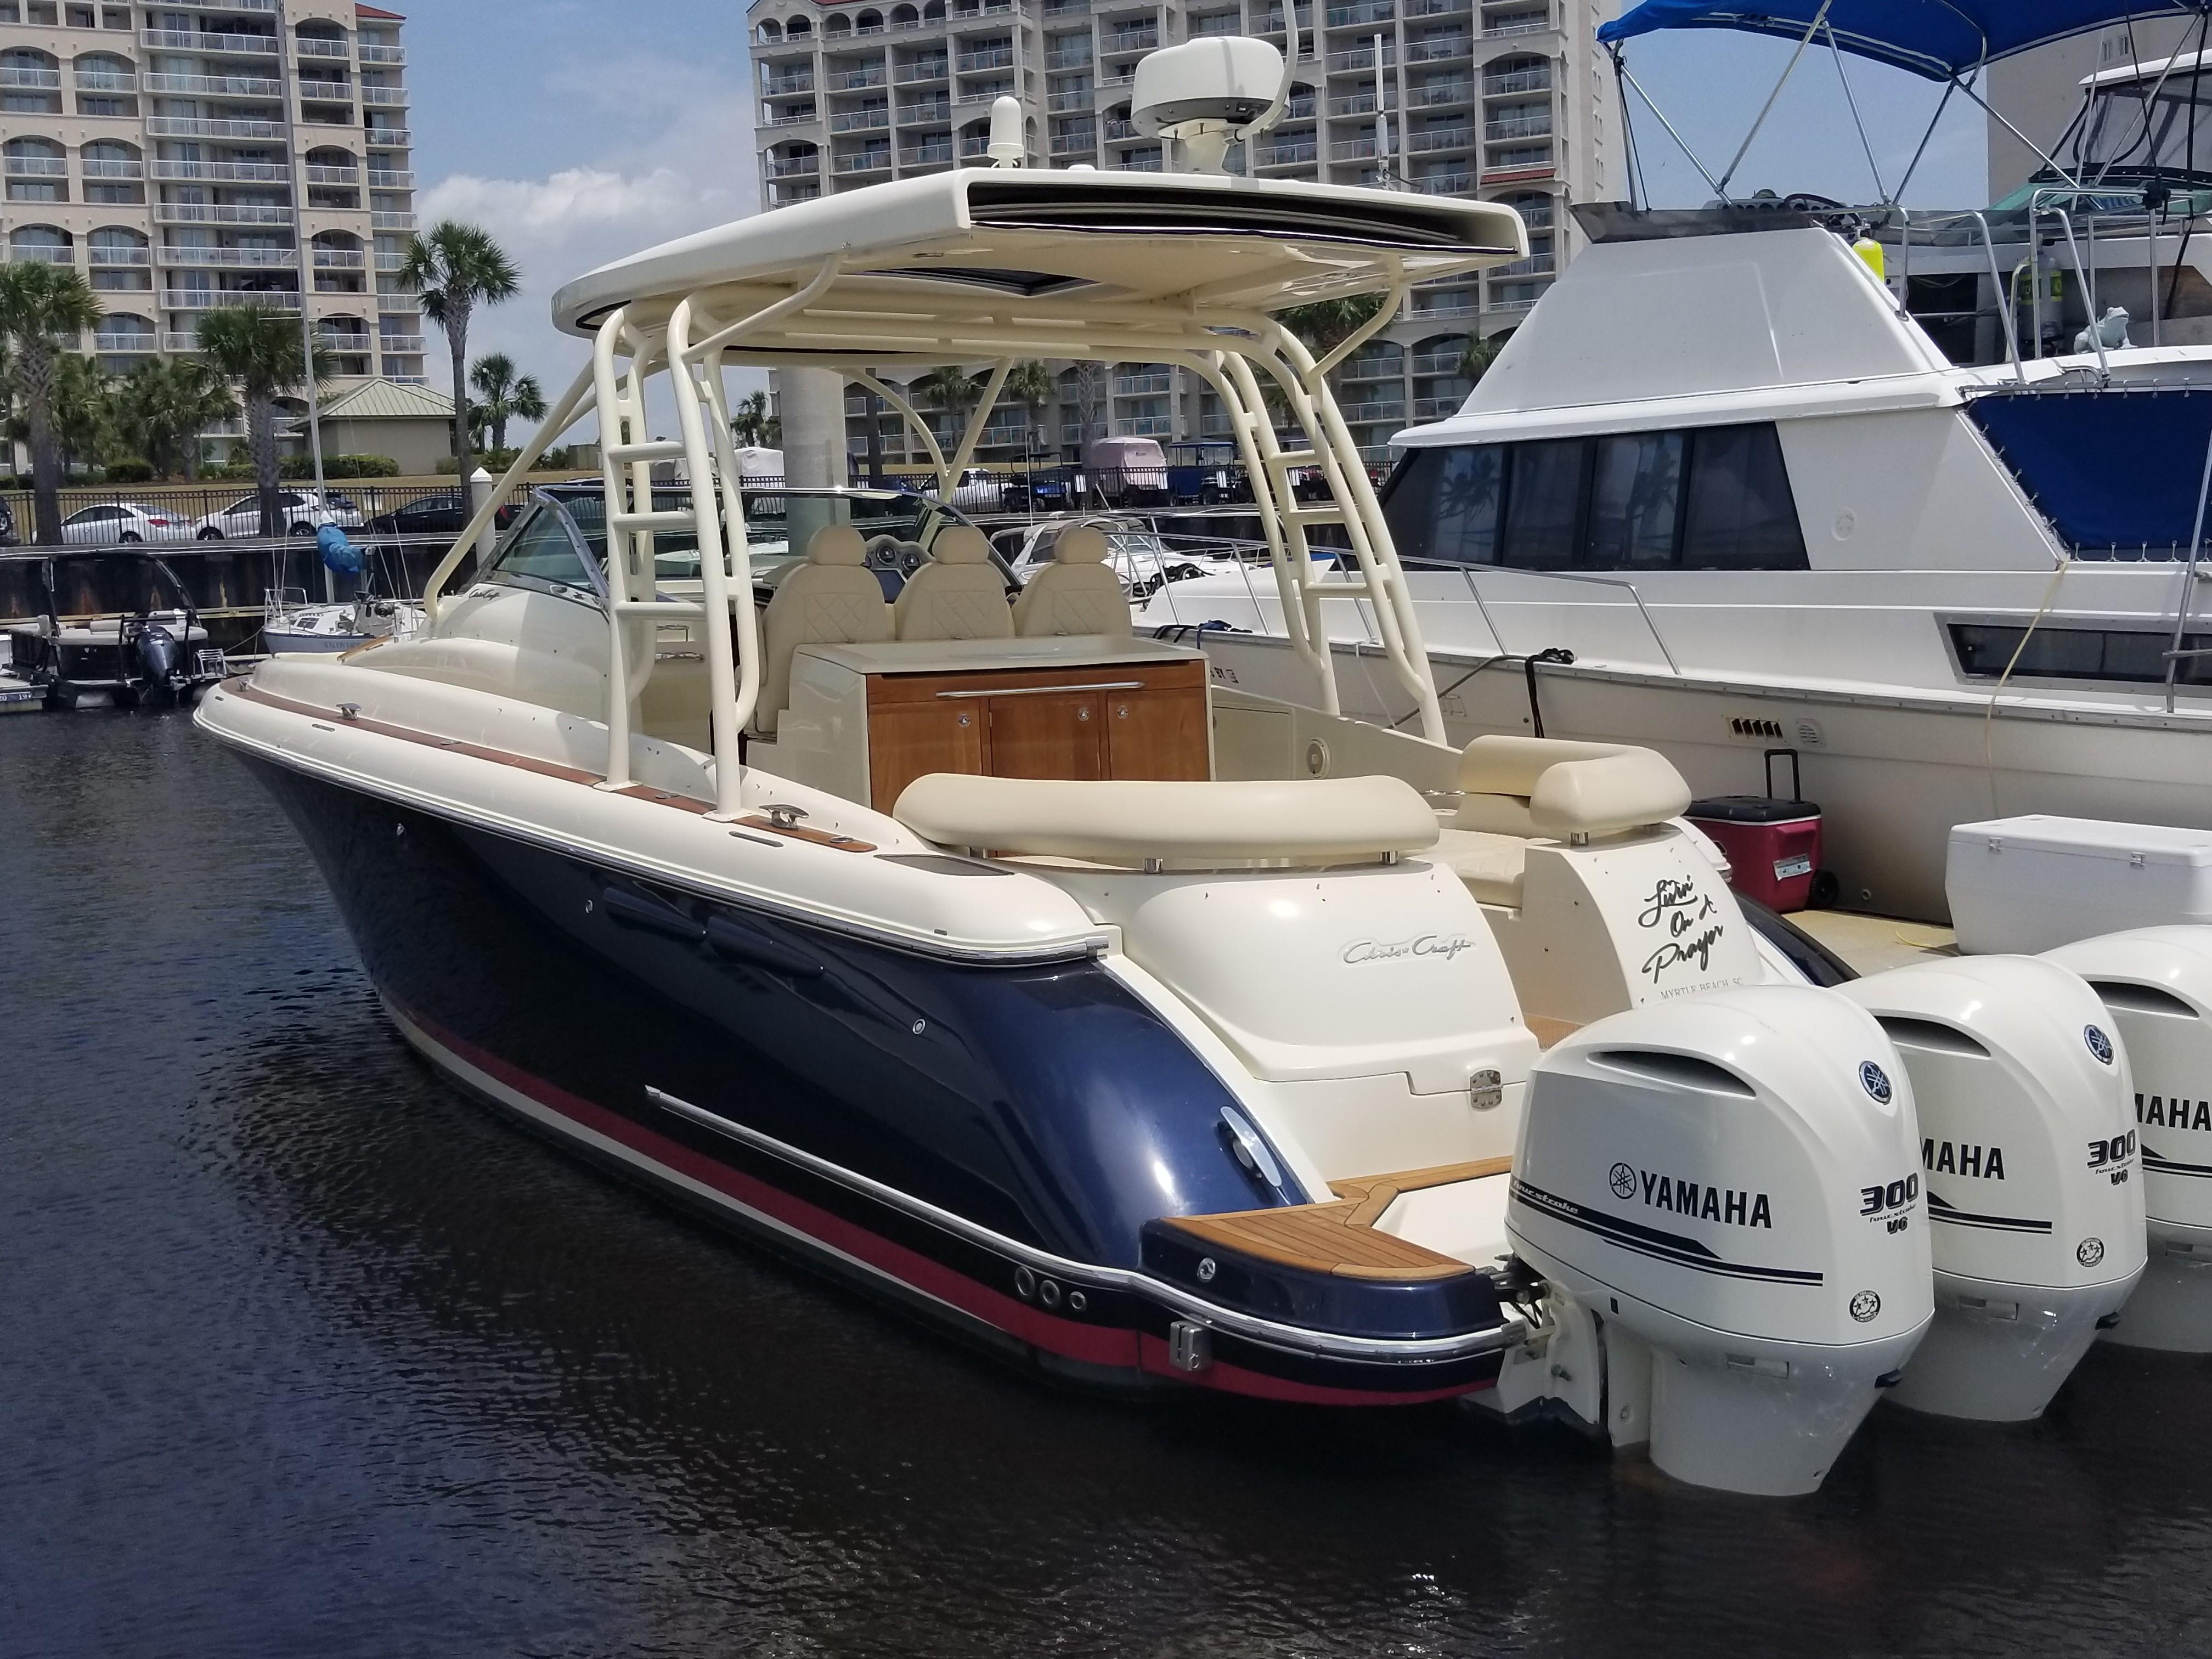 Chris-Craft Boats | Capri, Carina, Corsair, Launch, Calypso